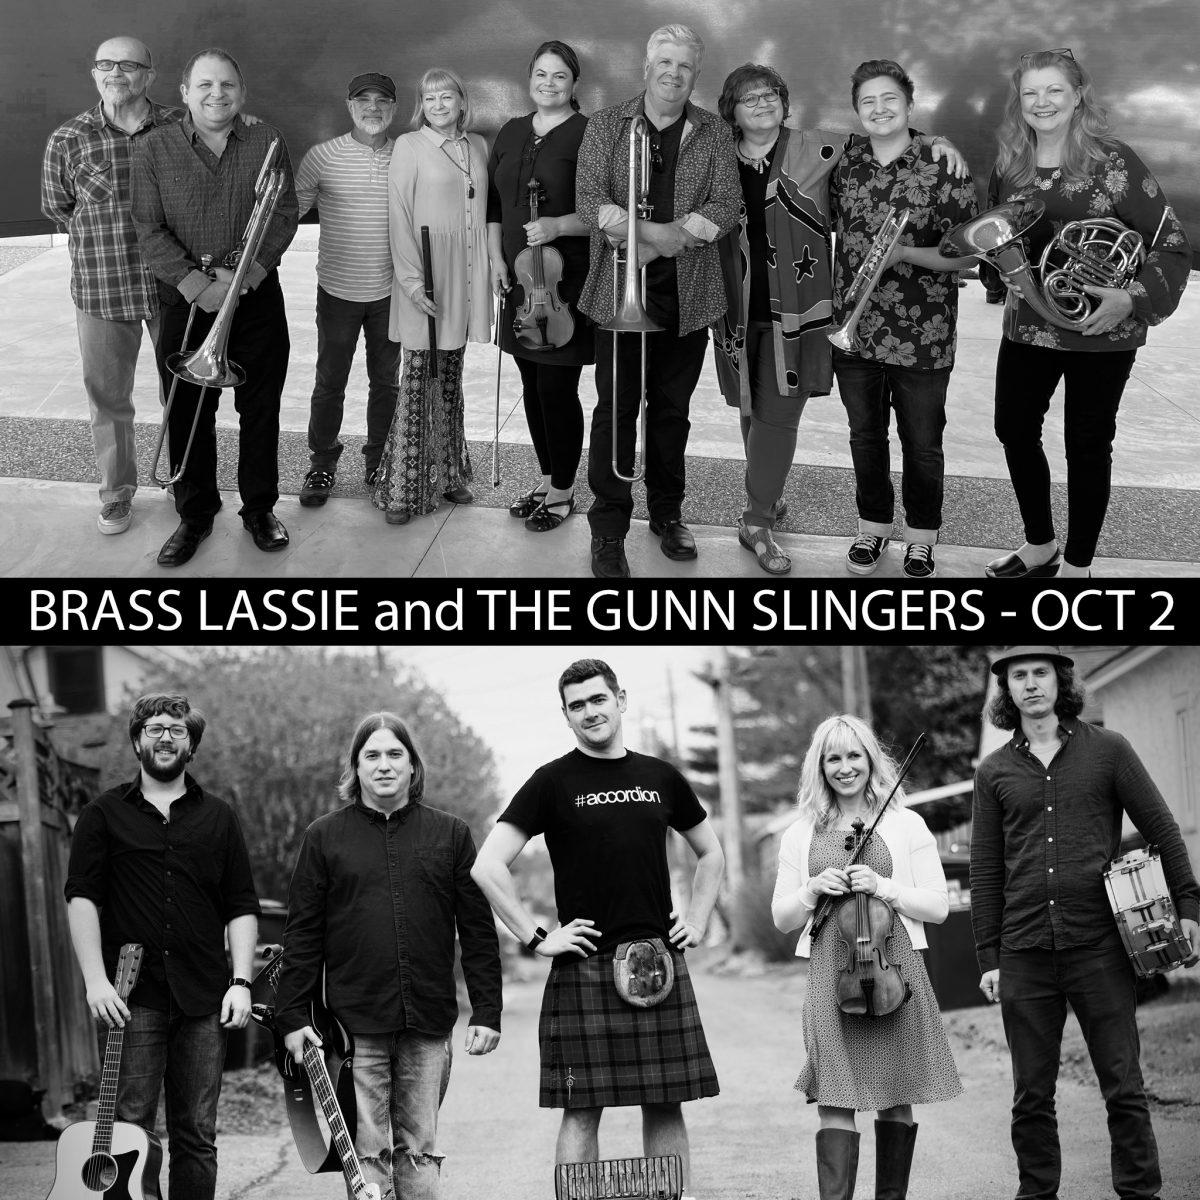 Brass Lassie and The Gunn Slingers